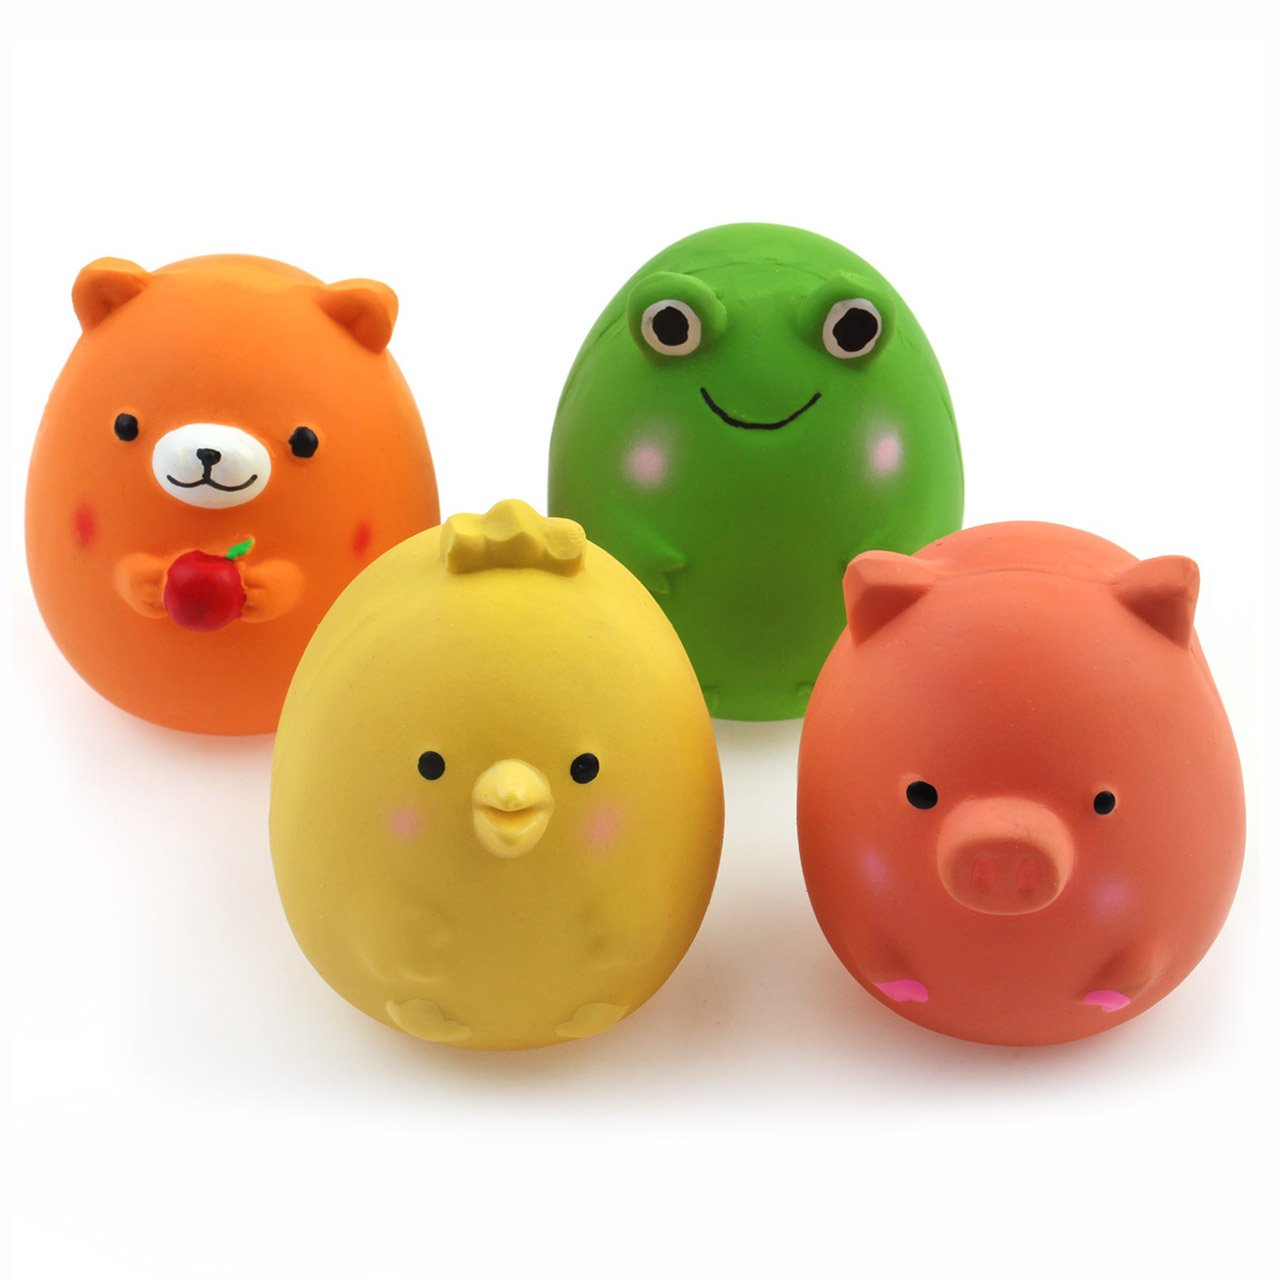 Chiwava 4PCS 6 cm Squeak látex juguetes para cachorros divertido animal conjuntos mascota interactiva jugar para